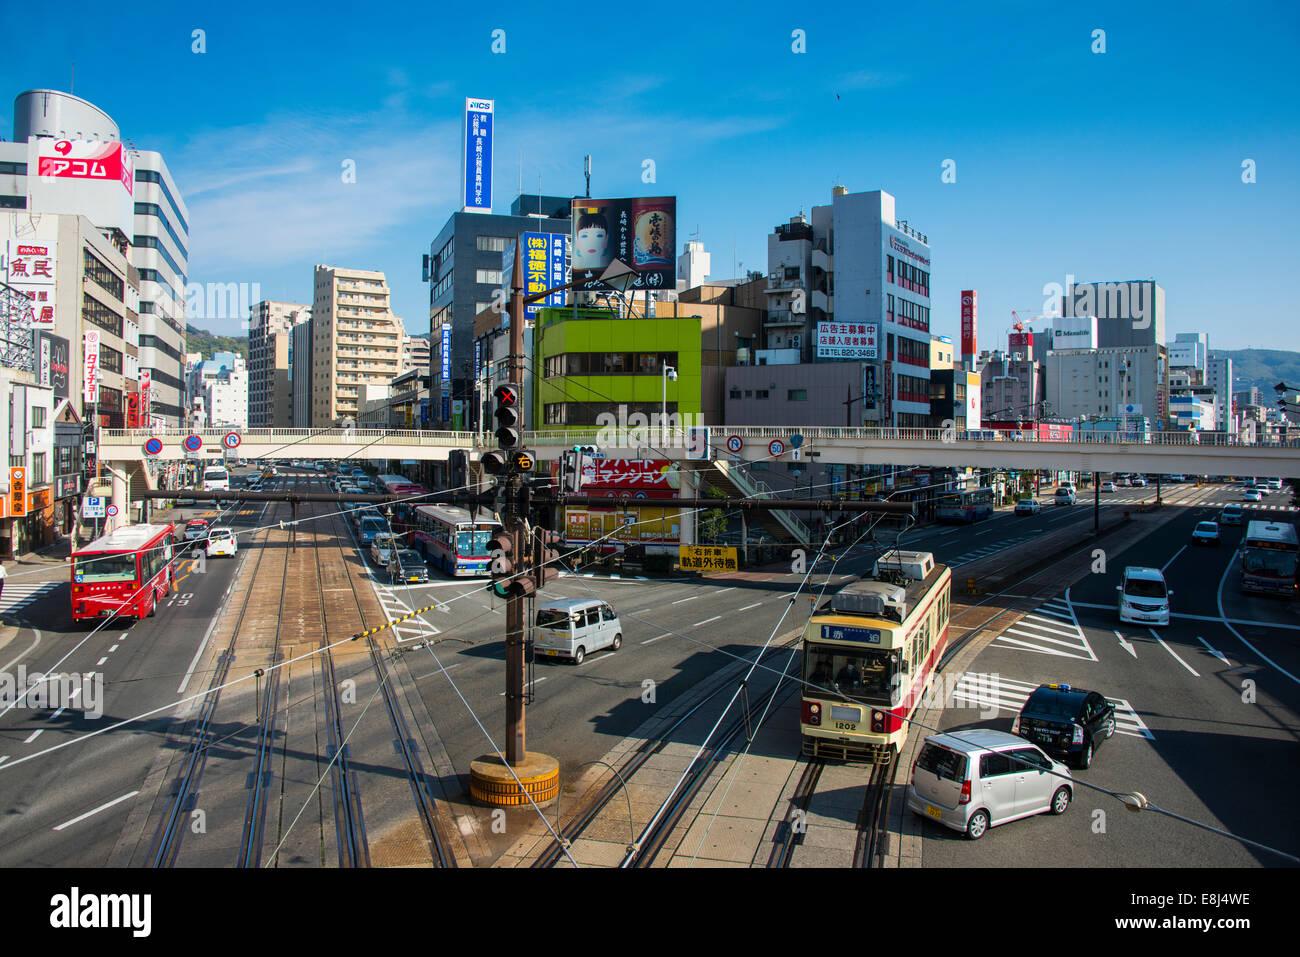 Streets in the city centre, Nagasaki, Japan Stock Photo